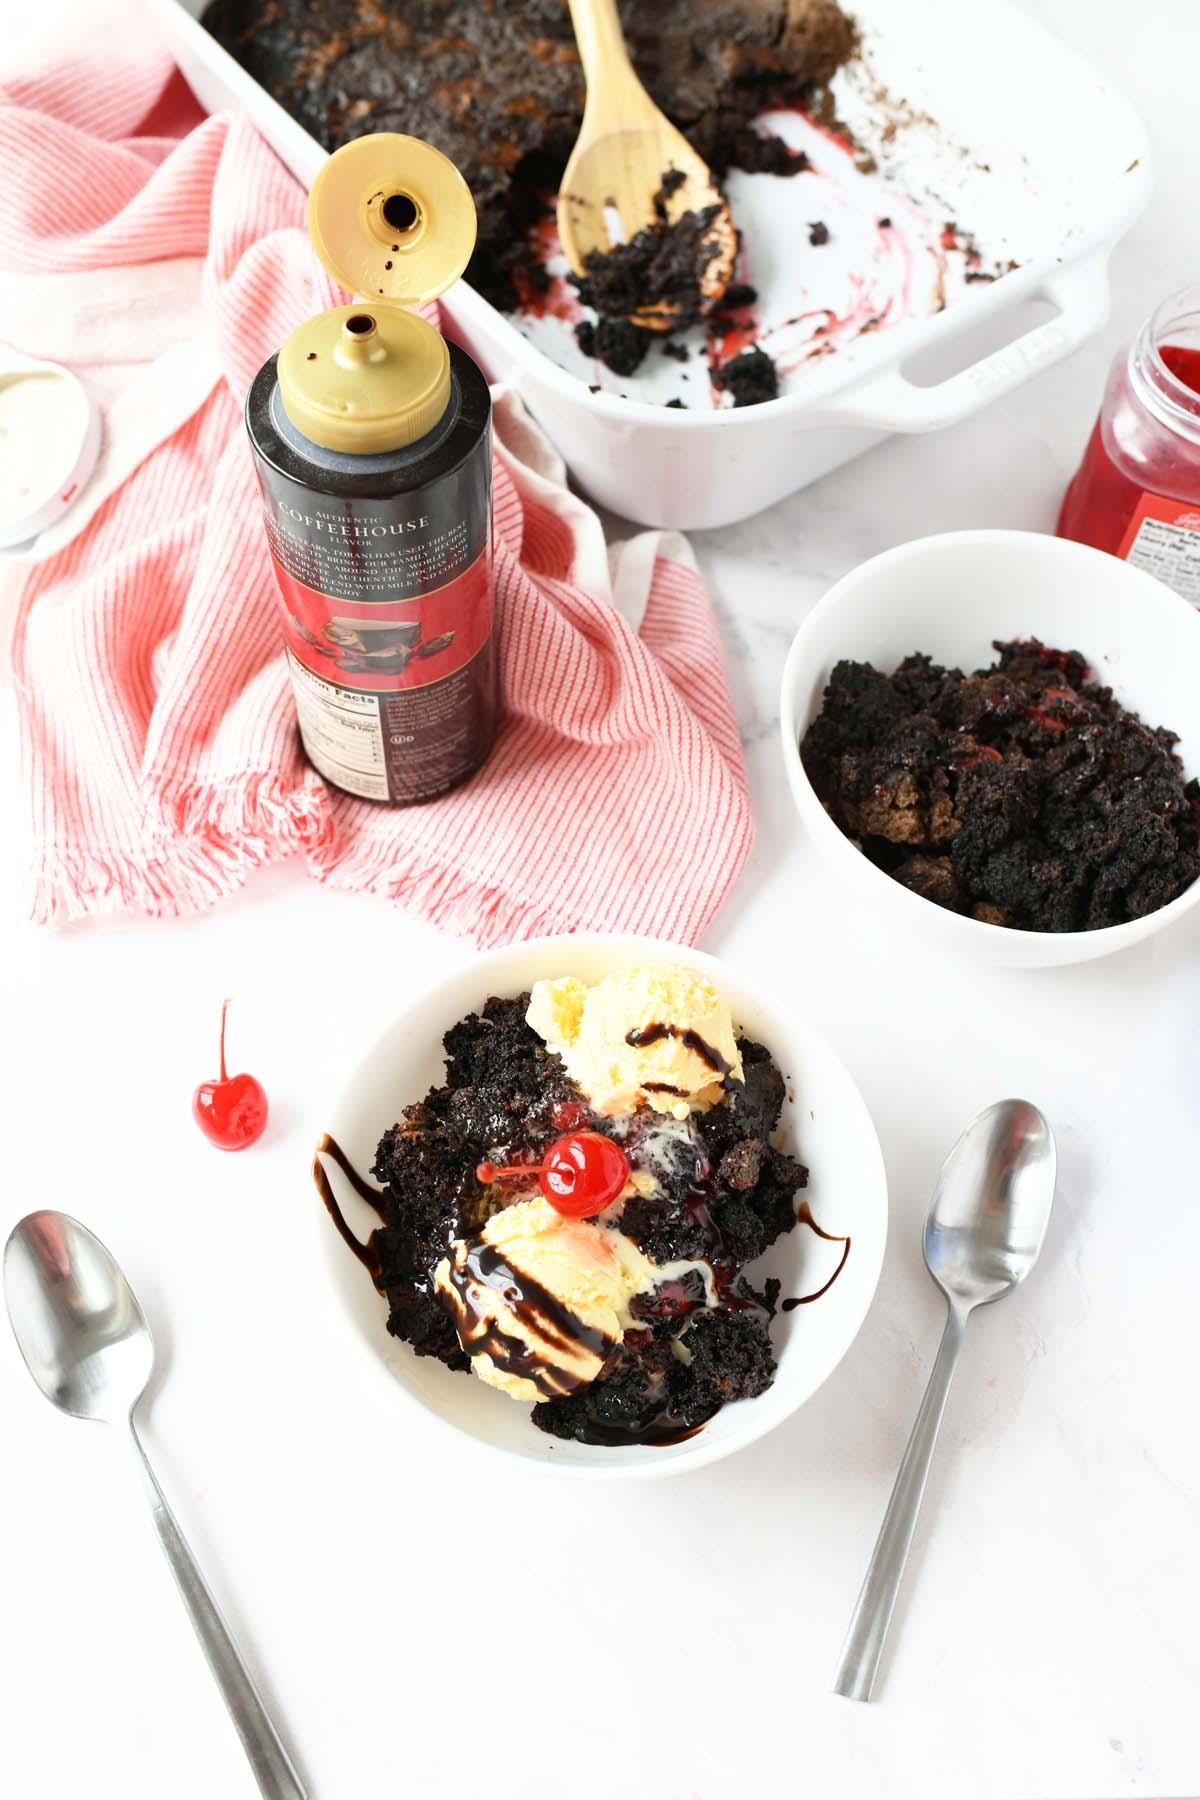 Chocolate cherry dump cake with ice cream and fudge.